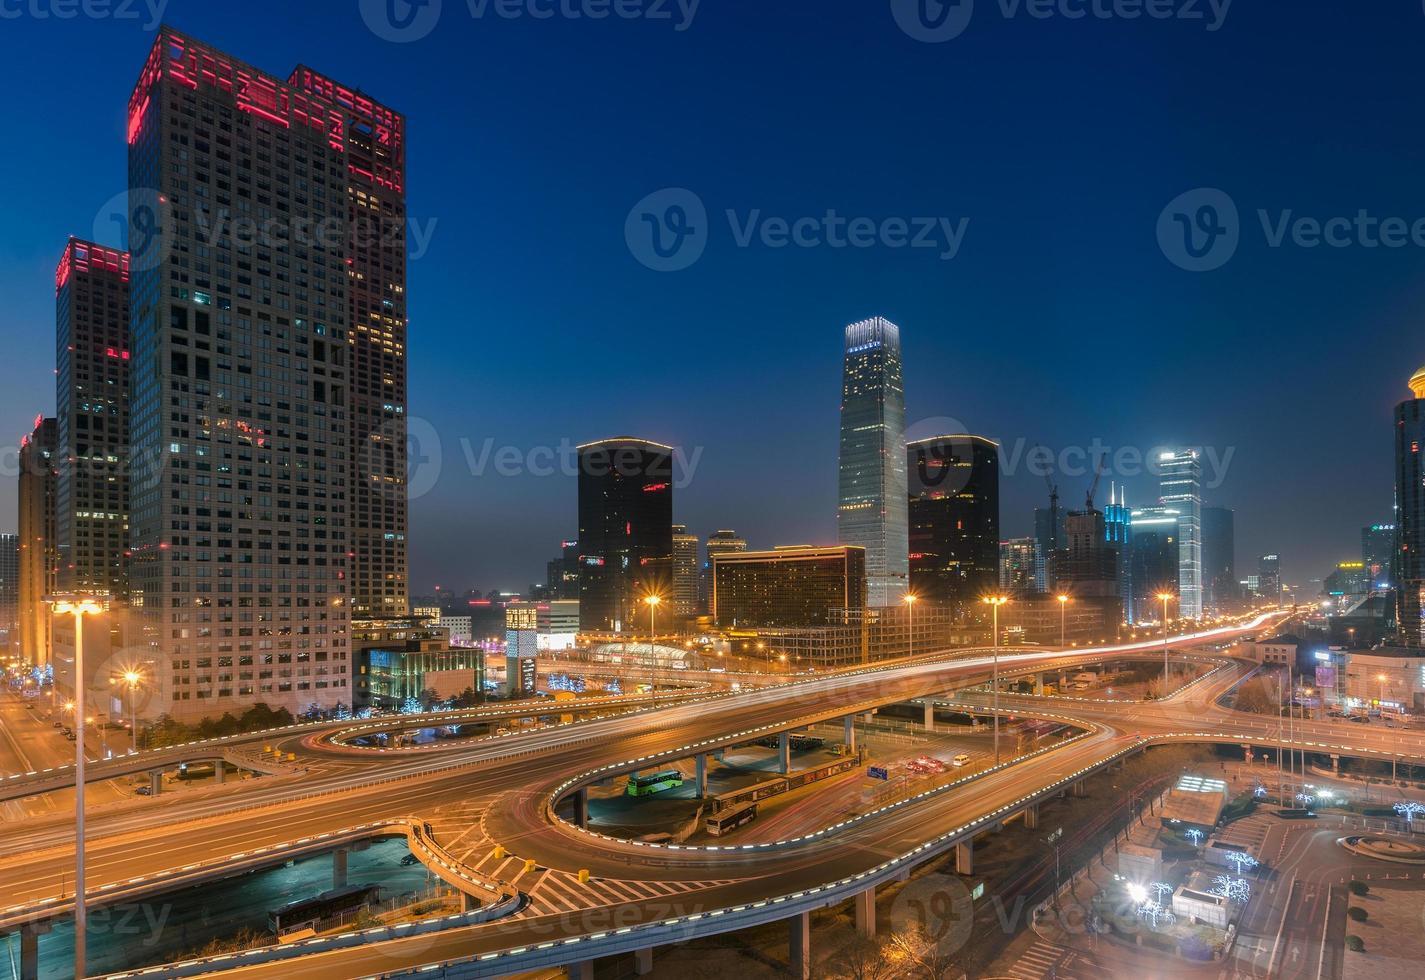 horizonte urbano crepuscular de beijing, la capital de china foto